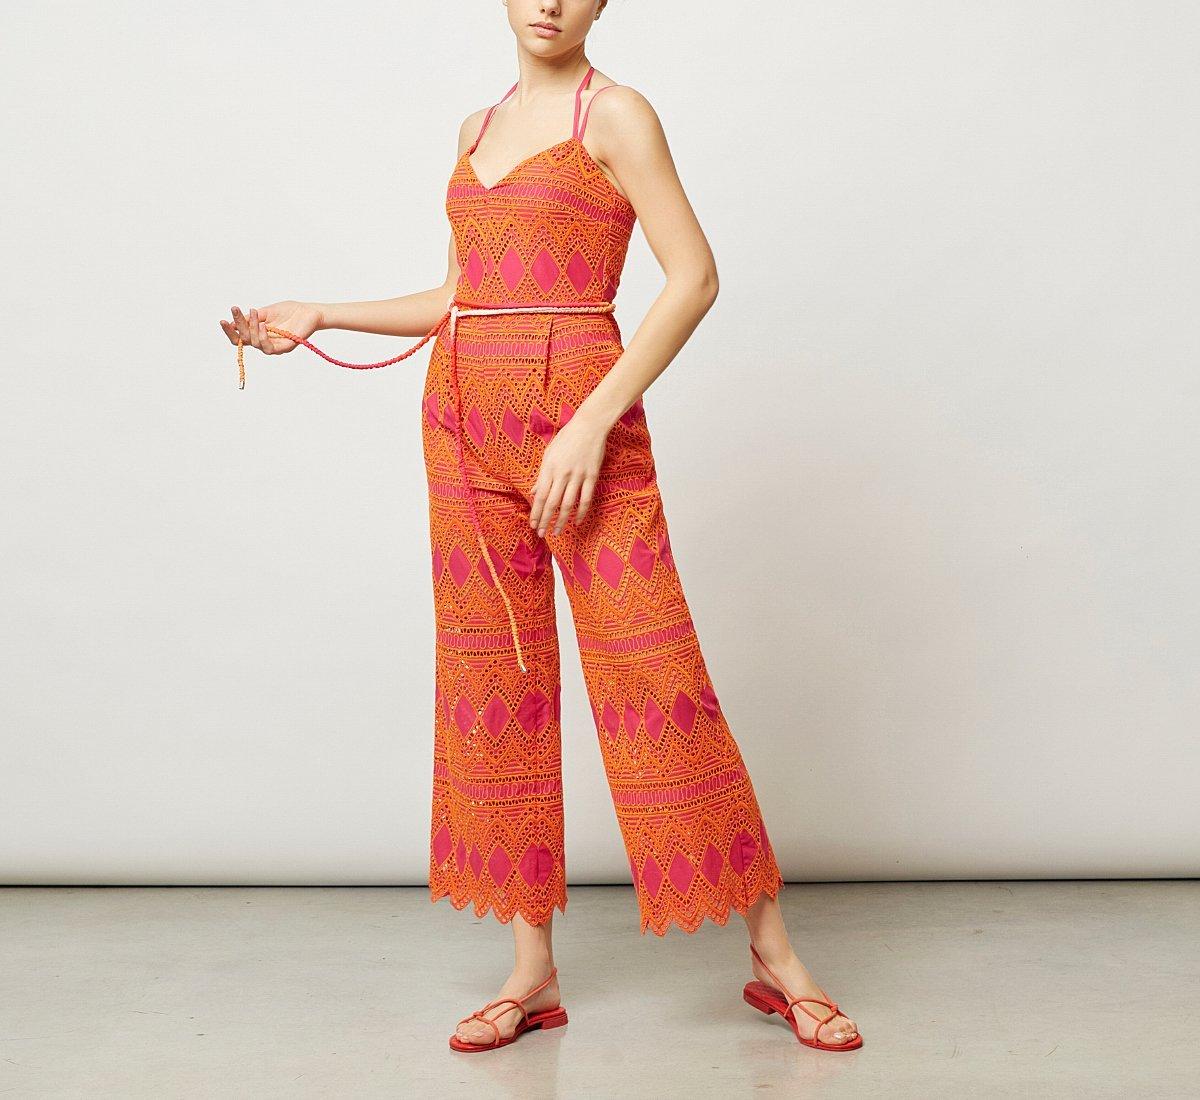 Jumpsuit with thin shoulder straps